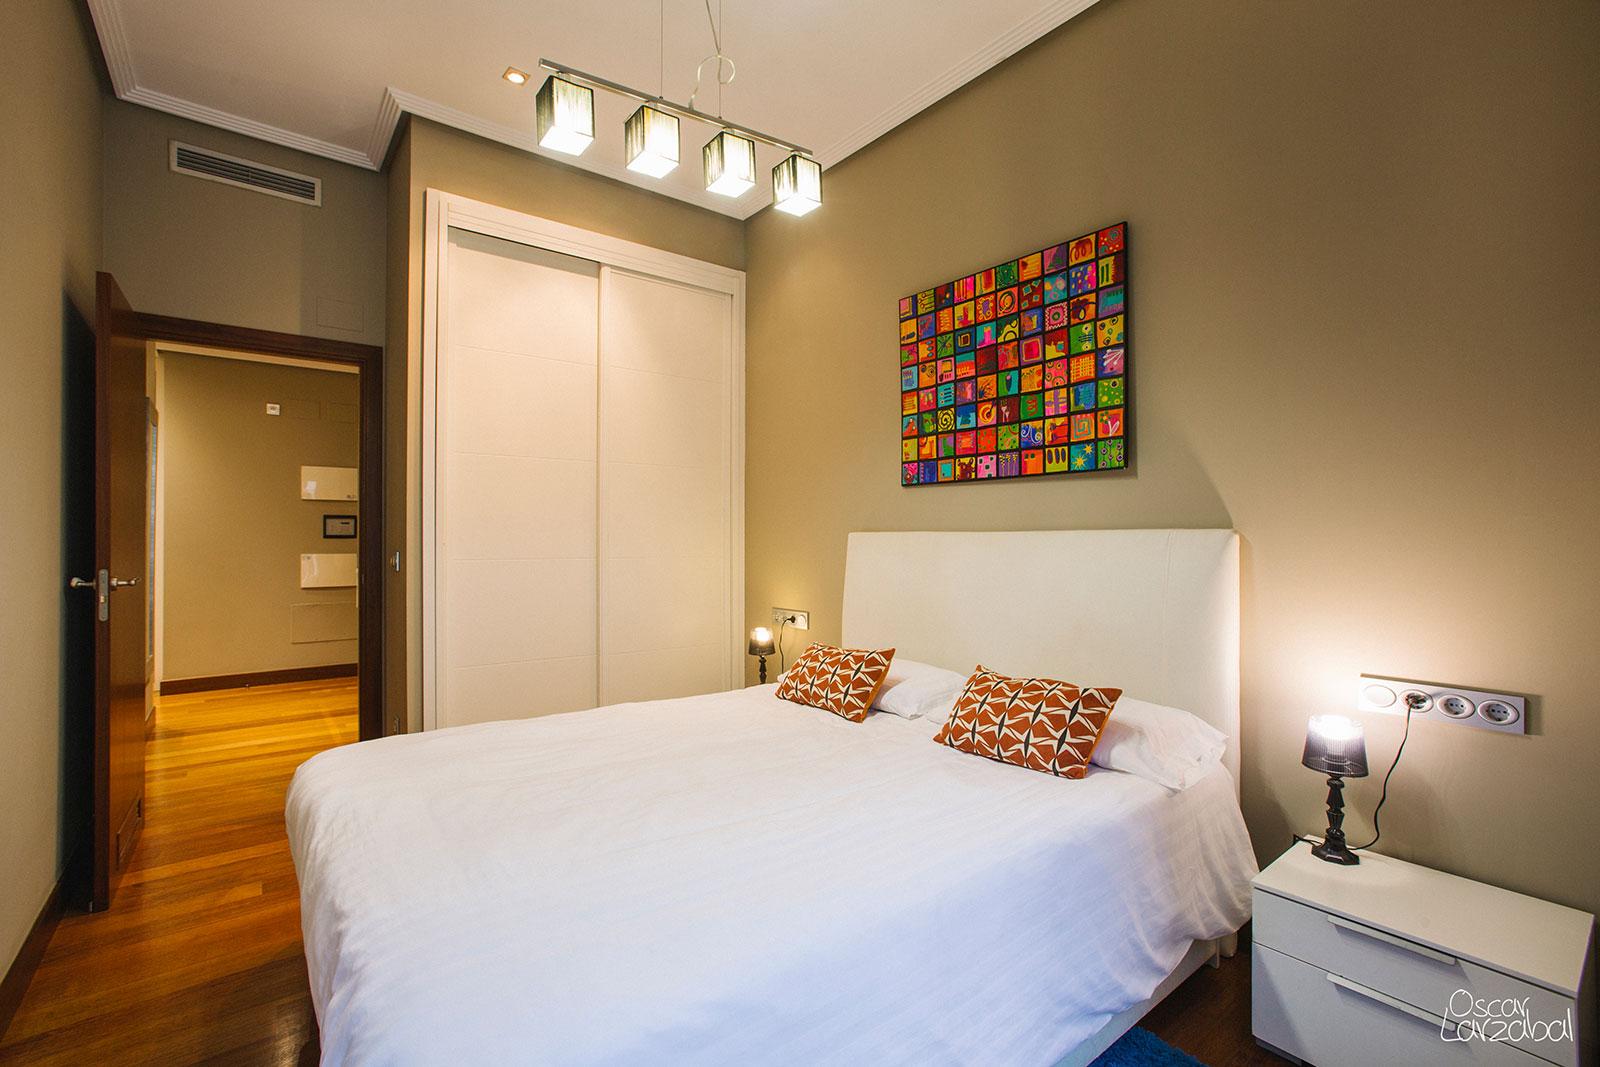 fotografo inmuebles fotos apartamentos turisticos Donostia San Sebastian